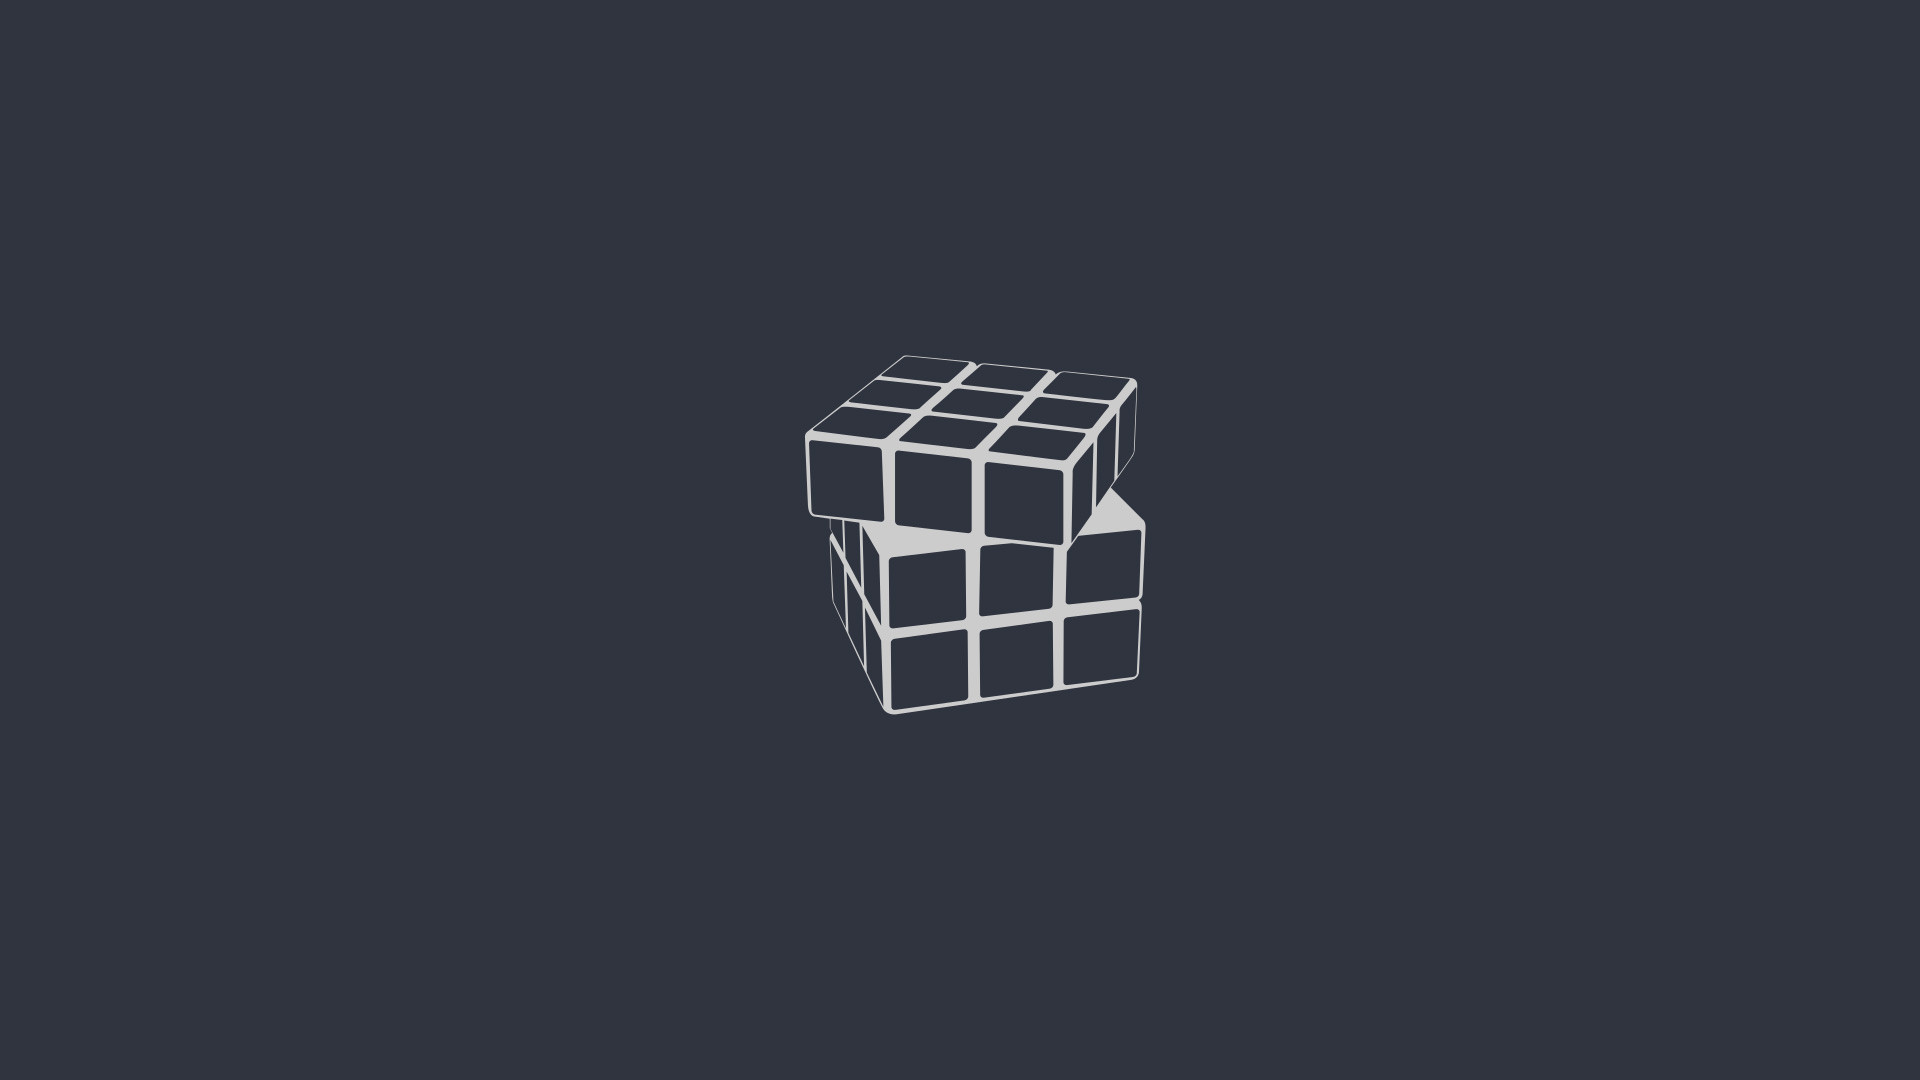 rubiks cube minimalism, hd artist, 4k wallpapers, images